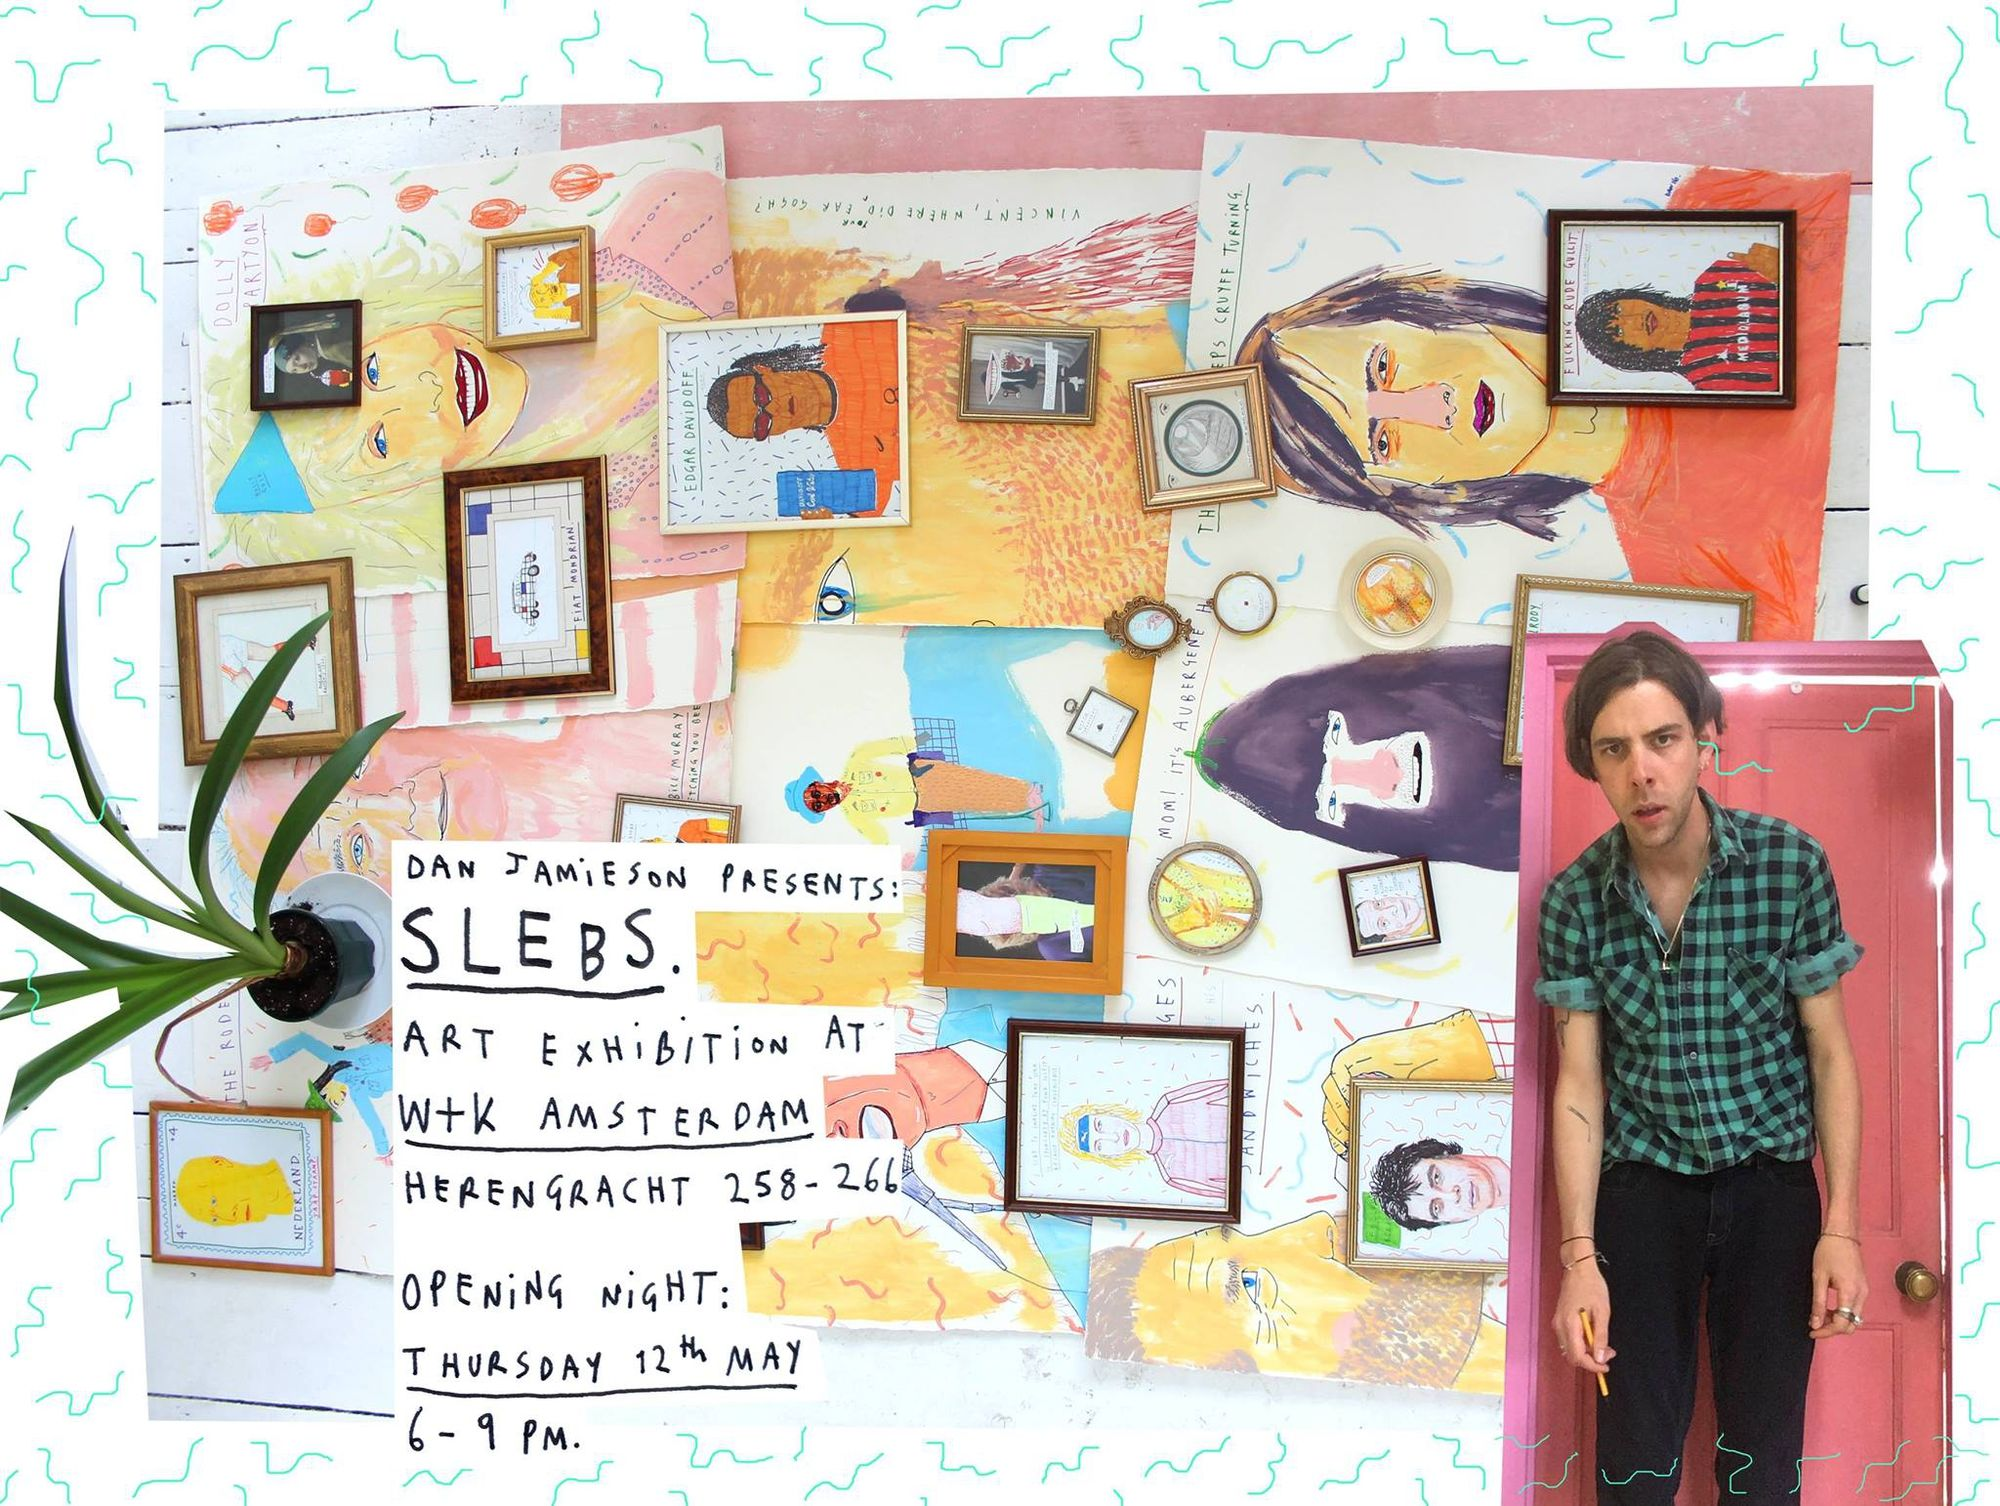 Wieden+Kennedy Amsterdam :  'SLEBS', an exhibition by London-based artist Dan Jamieson